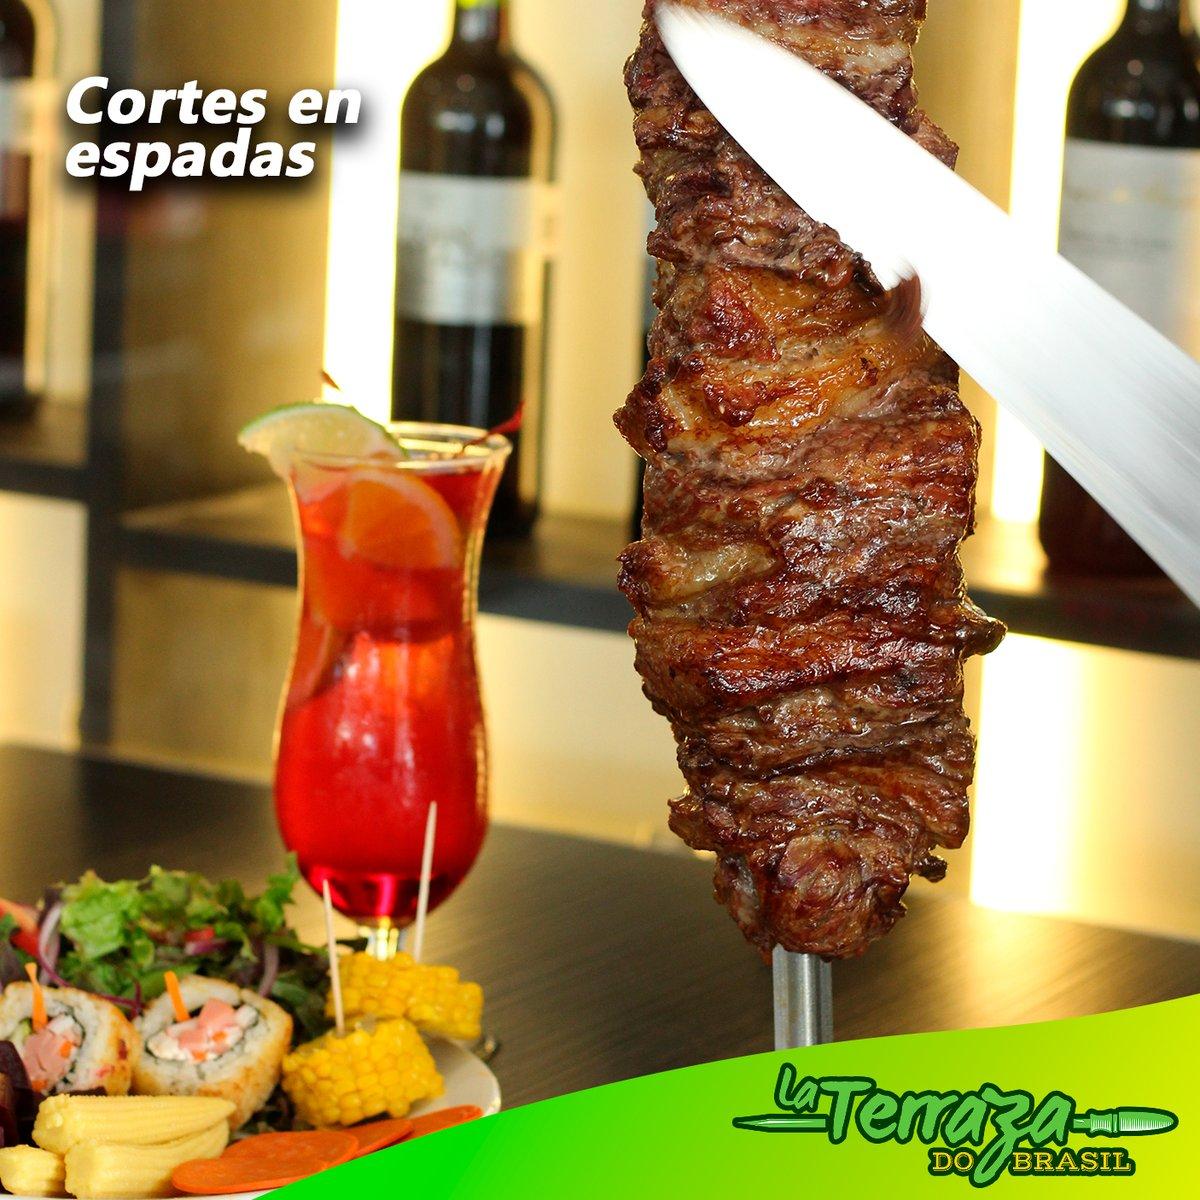 Lifestyle Veracruz Lifestylevera Twitter